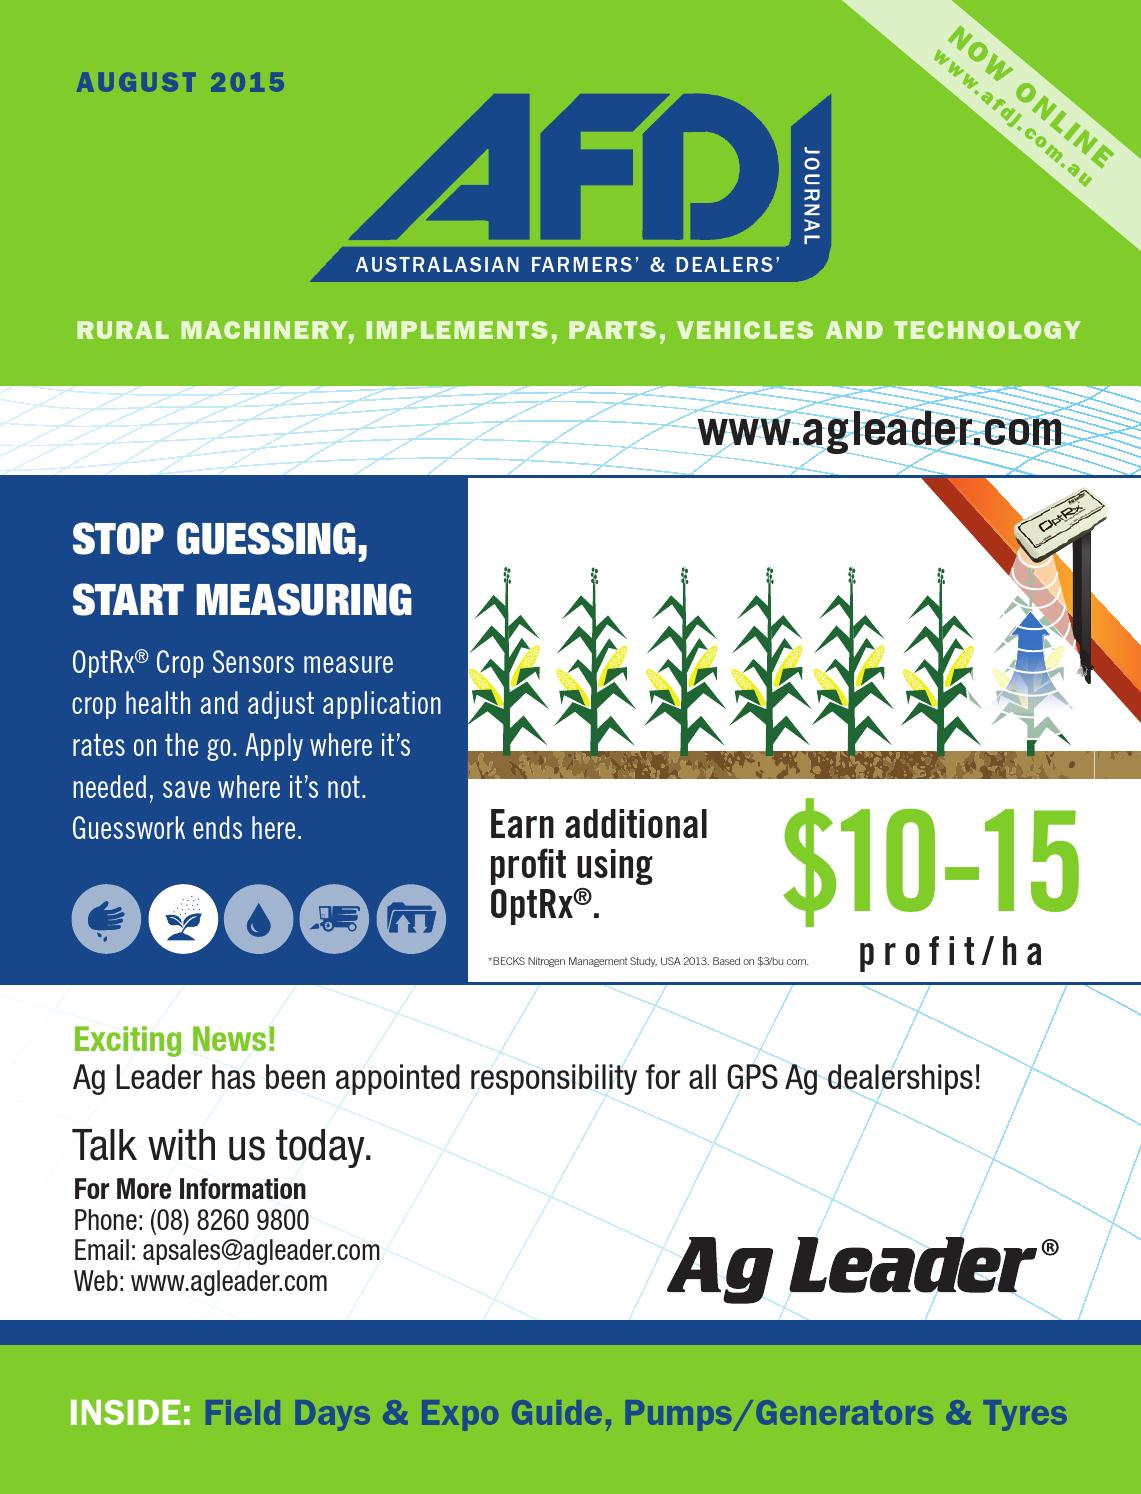 Australian Farmers' & Dealers' Journal - August 2015 by provincial press  group - issuu